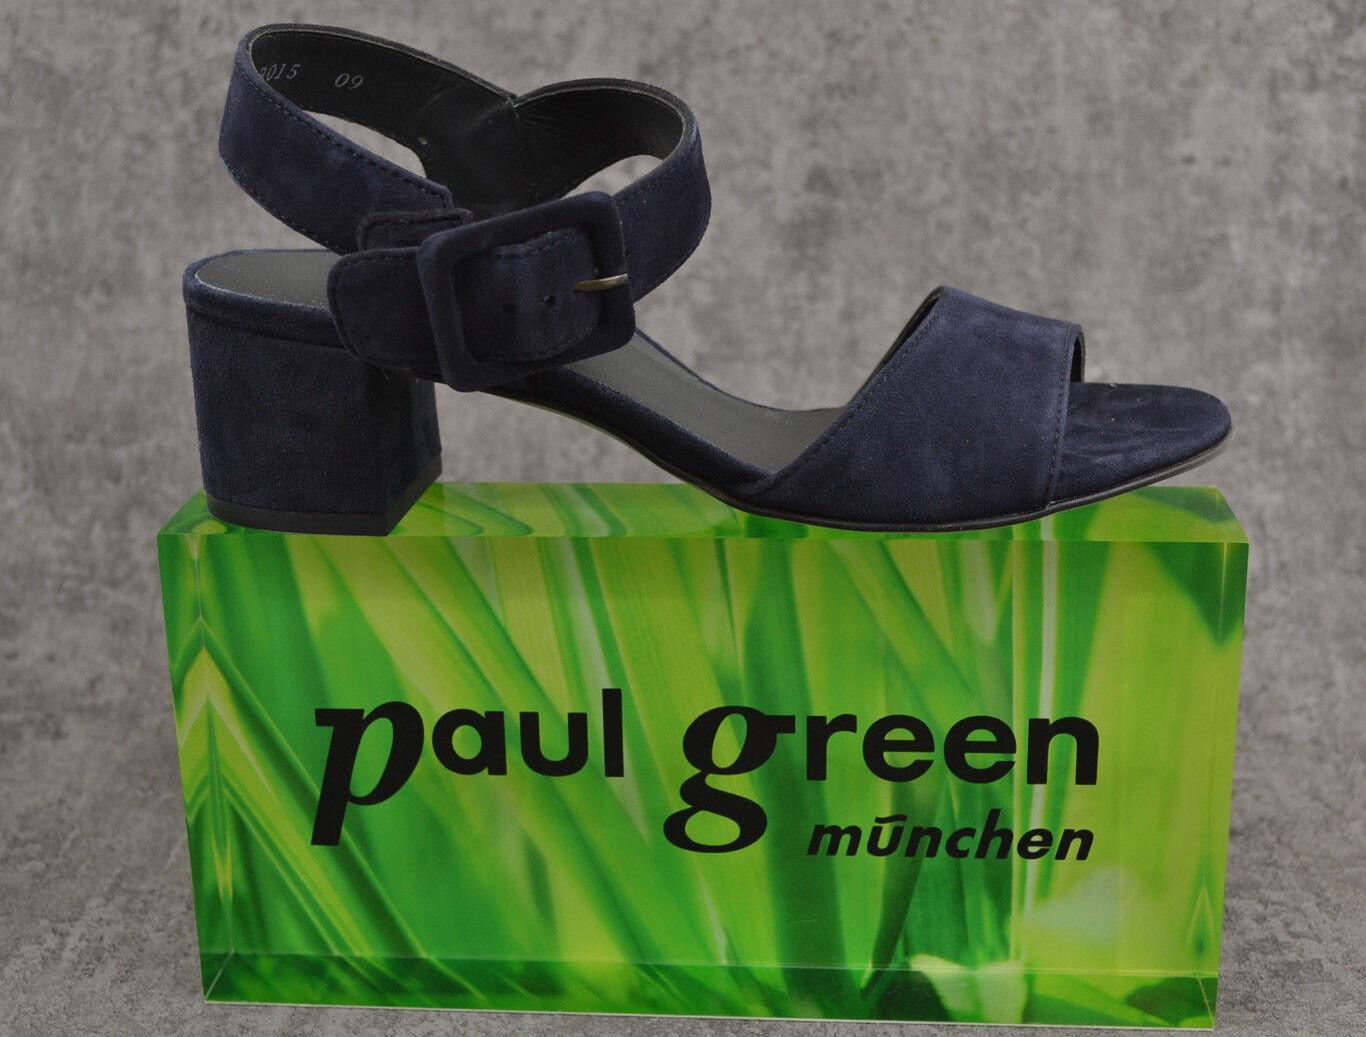 NEU Paul Green  elegante Damen Sandalette Samtziege blau Leder  Green 6092 022 1c959b